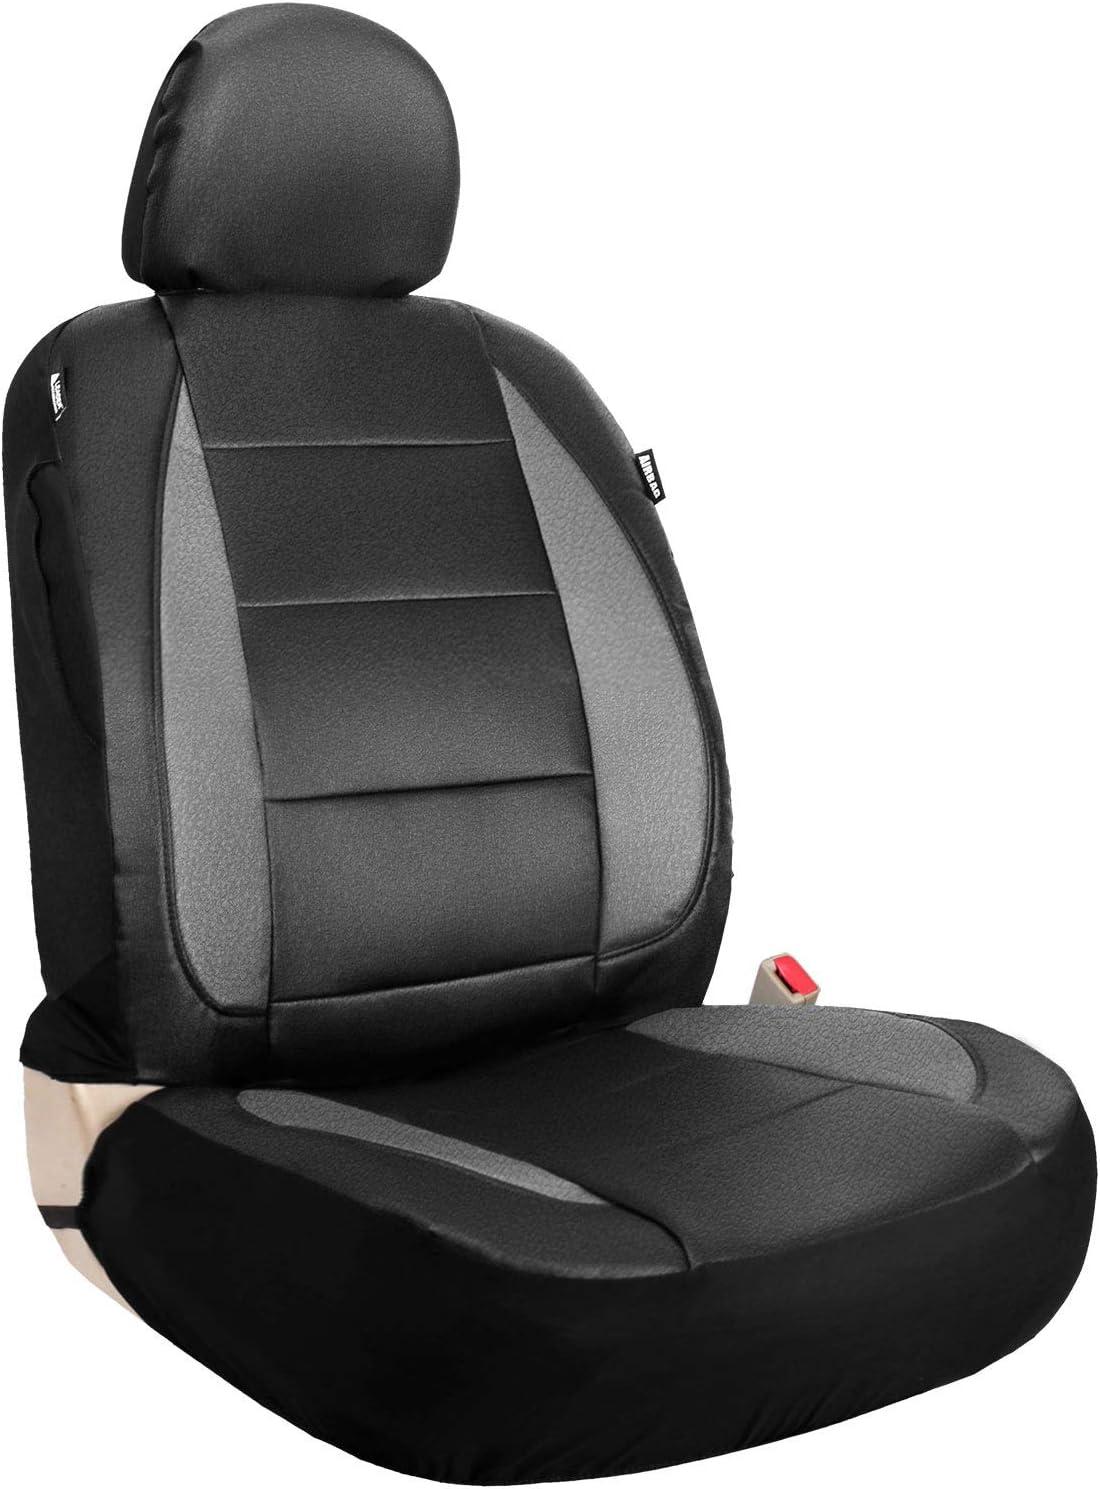 Passenger Seat Bracket for MOMO // NRG // Sparco // Recaro // Bride // OMP - Part # SB115PA Mazda RX7 1986-1991